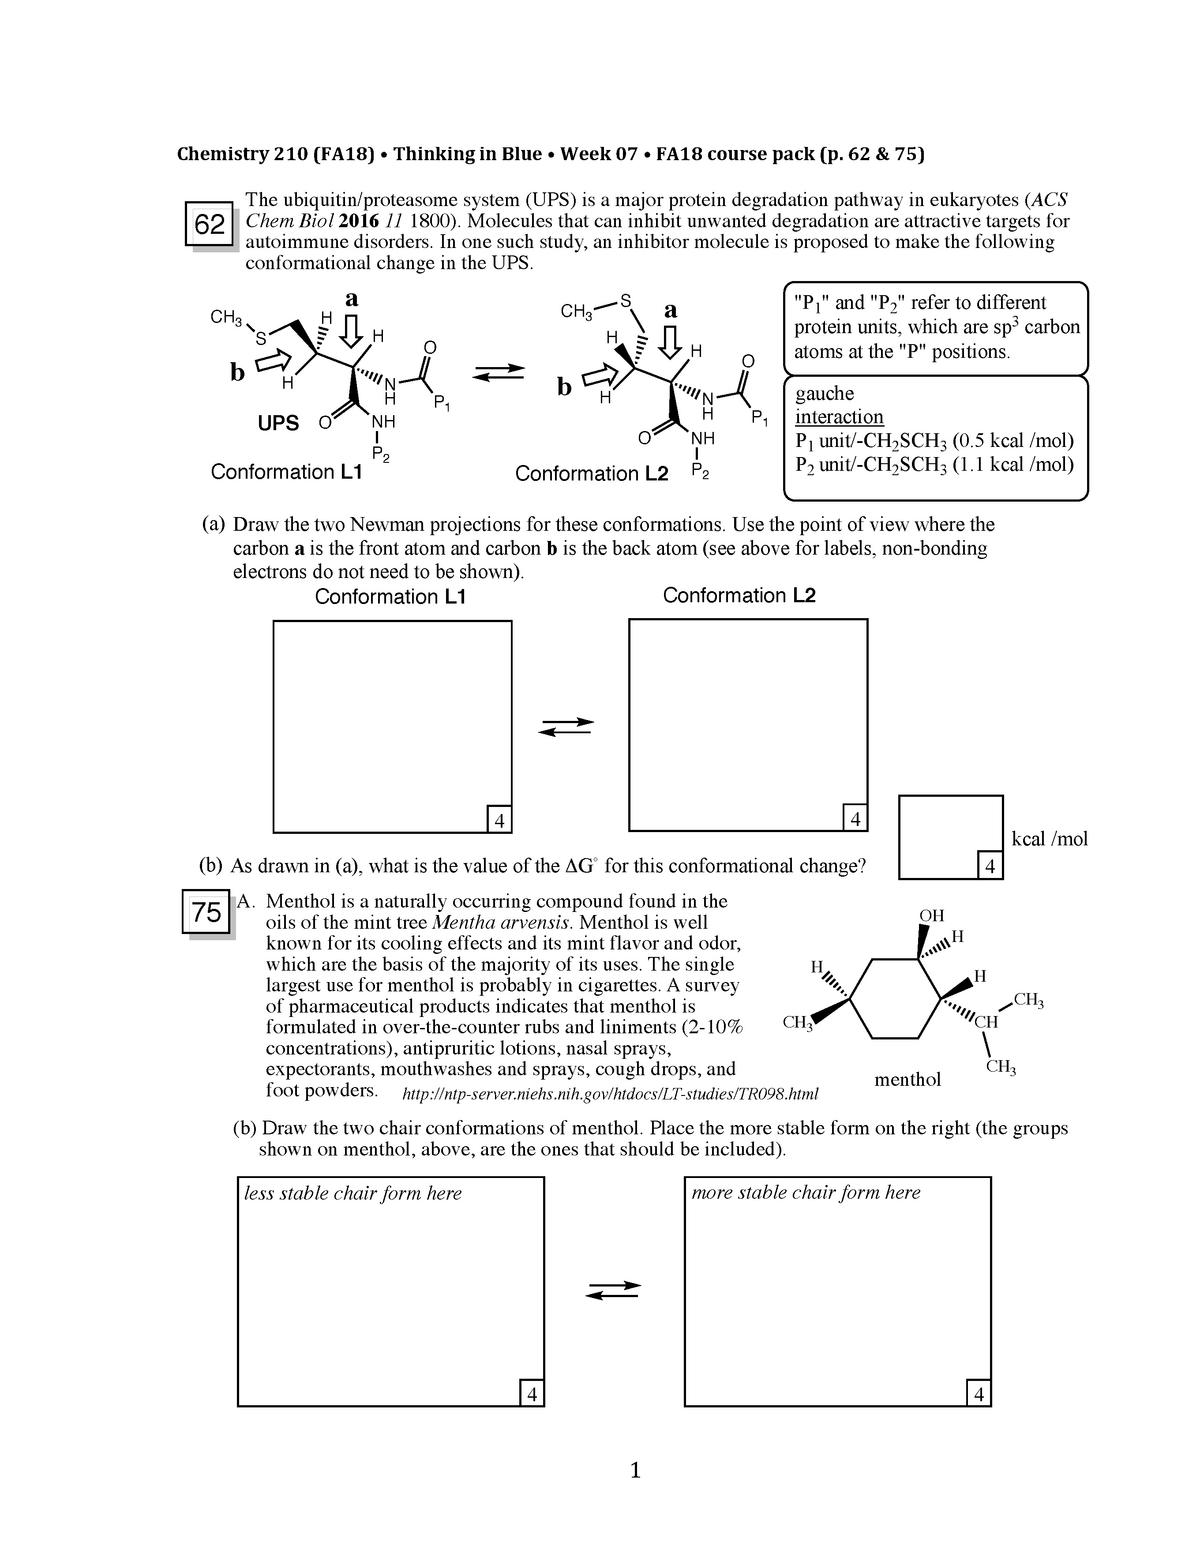 TIB210 Week 07 - CHEM 210: Structure and Reactivity I - StuDocu